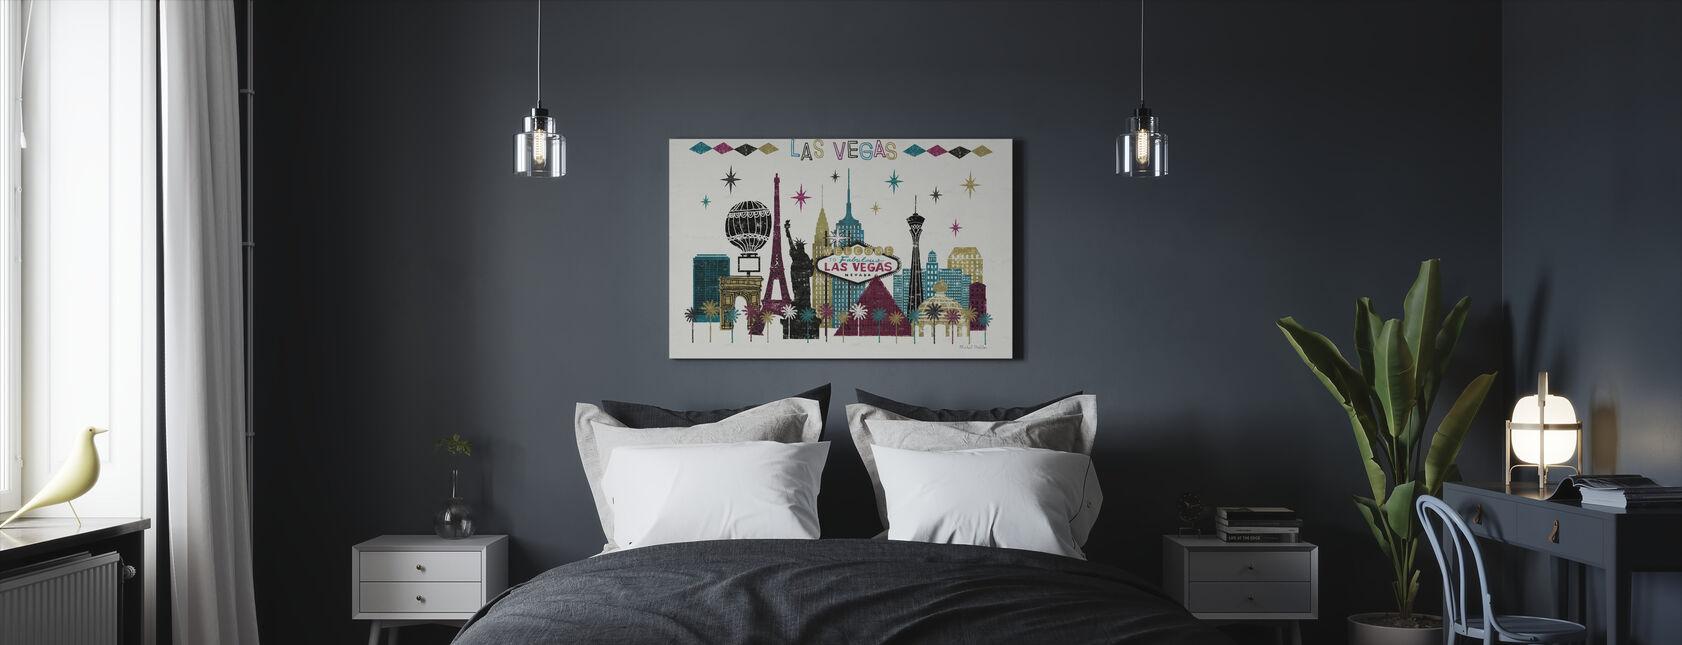 Las Vegas Skyline - Canvas print - Slaapkamer